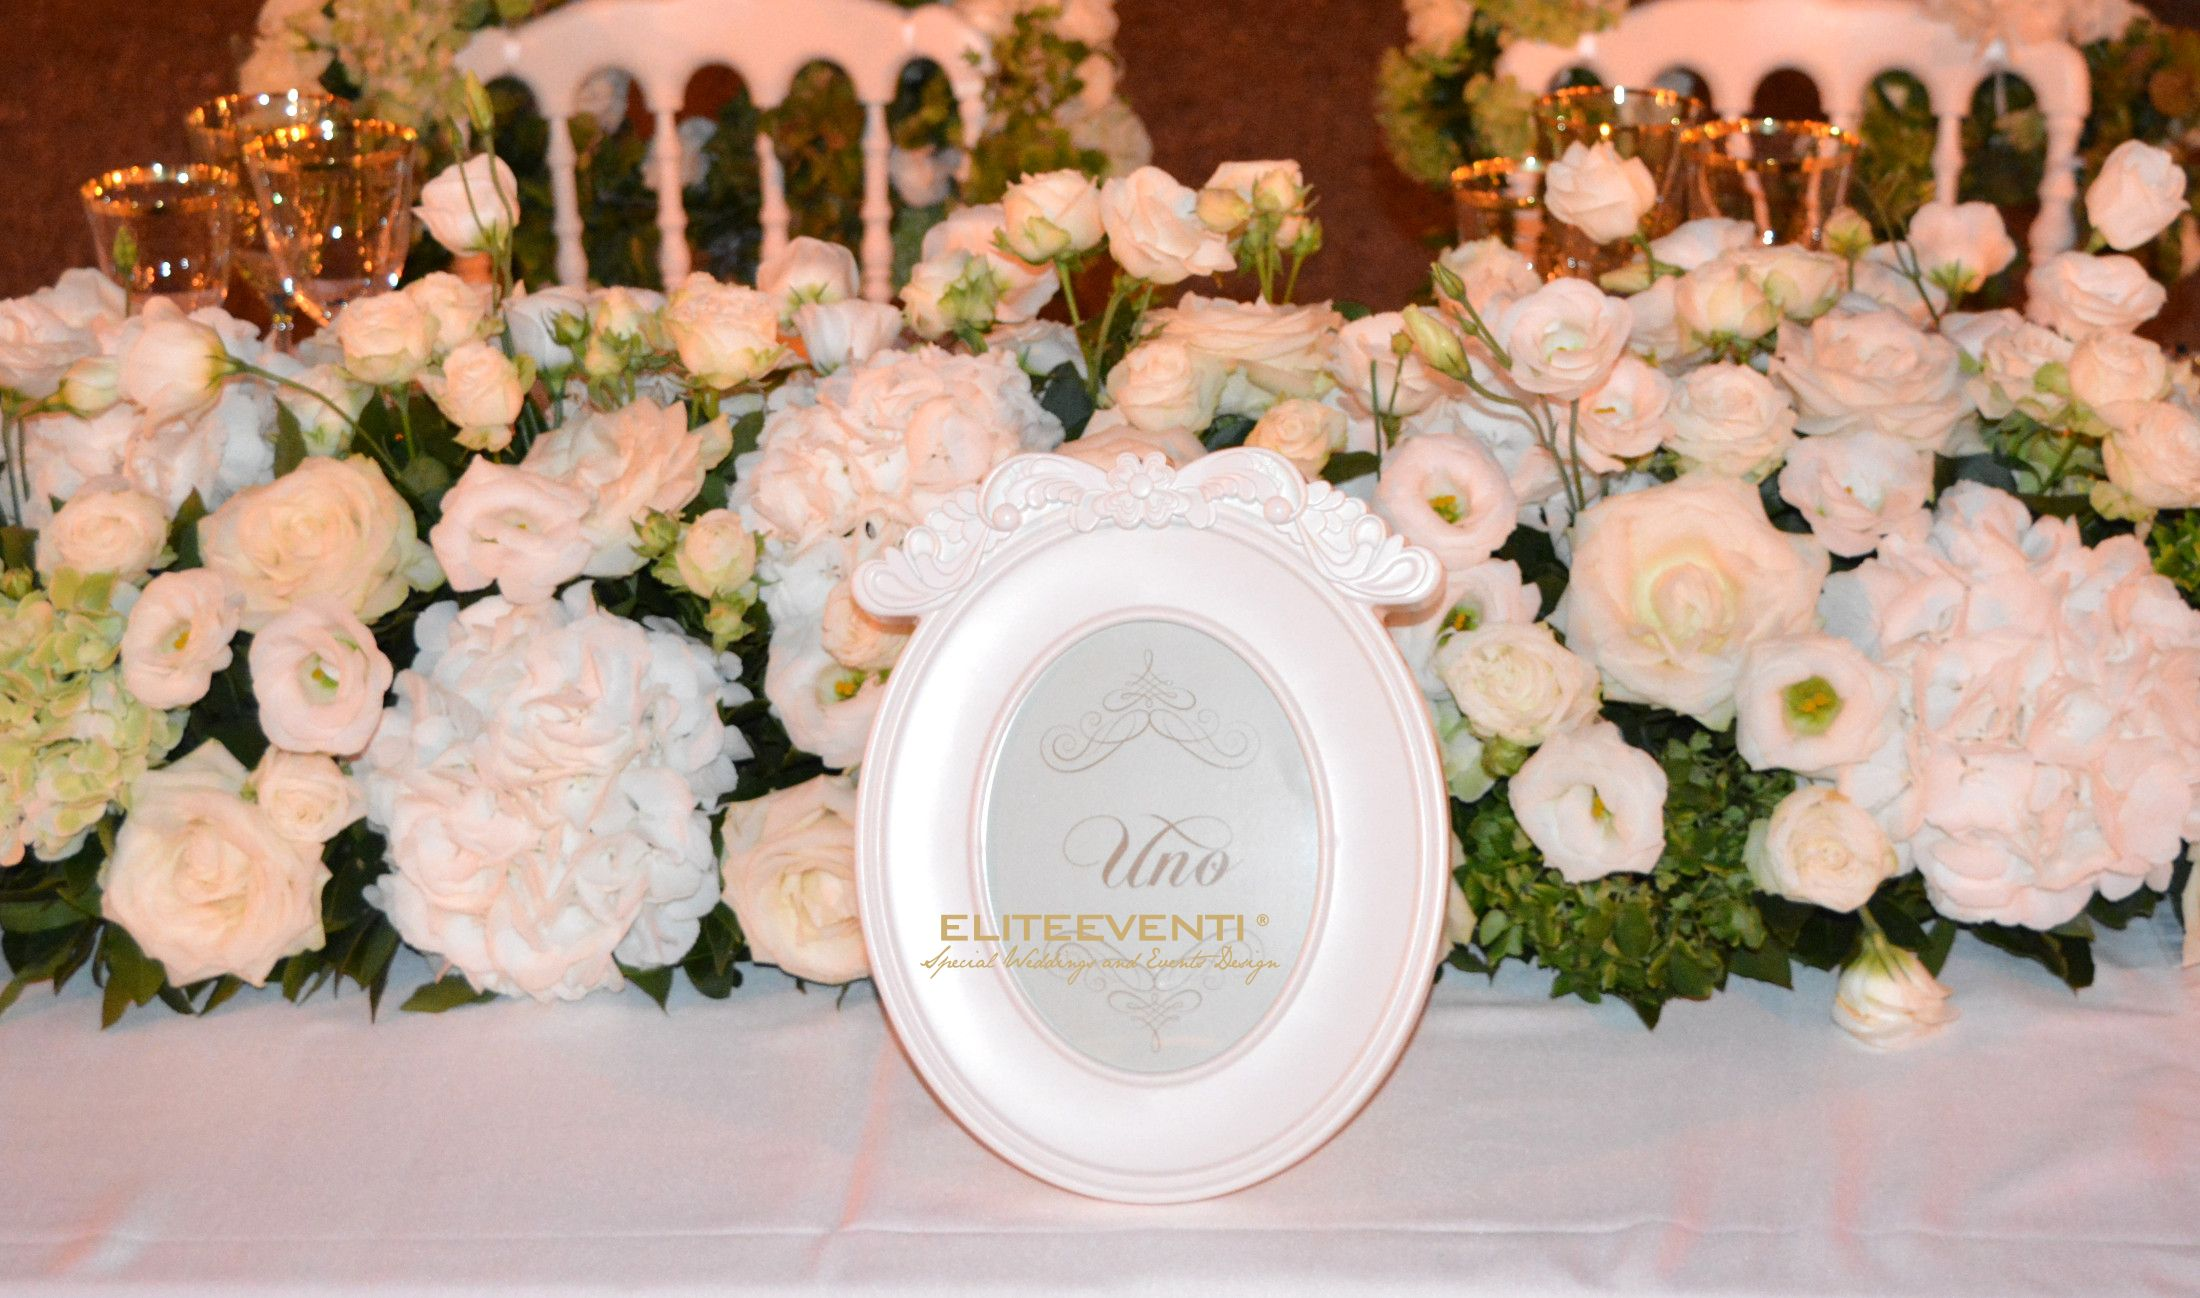 Decorazioni_Charming_Wedding-eliteeventi